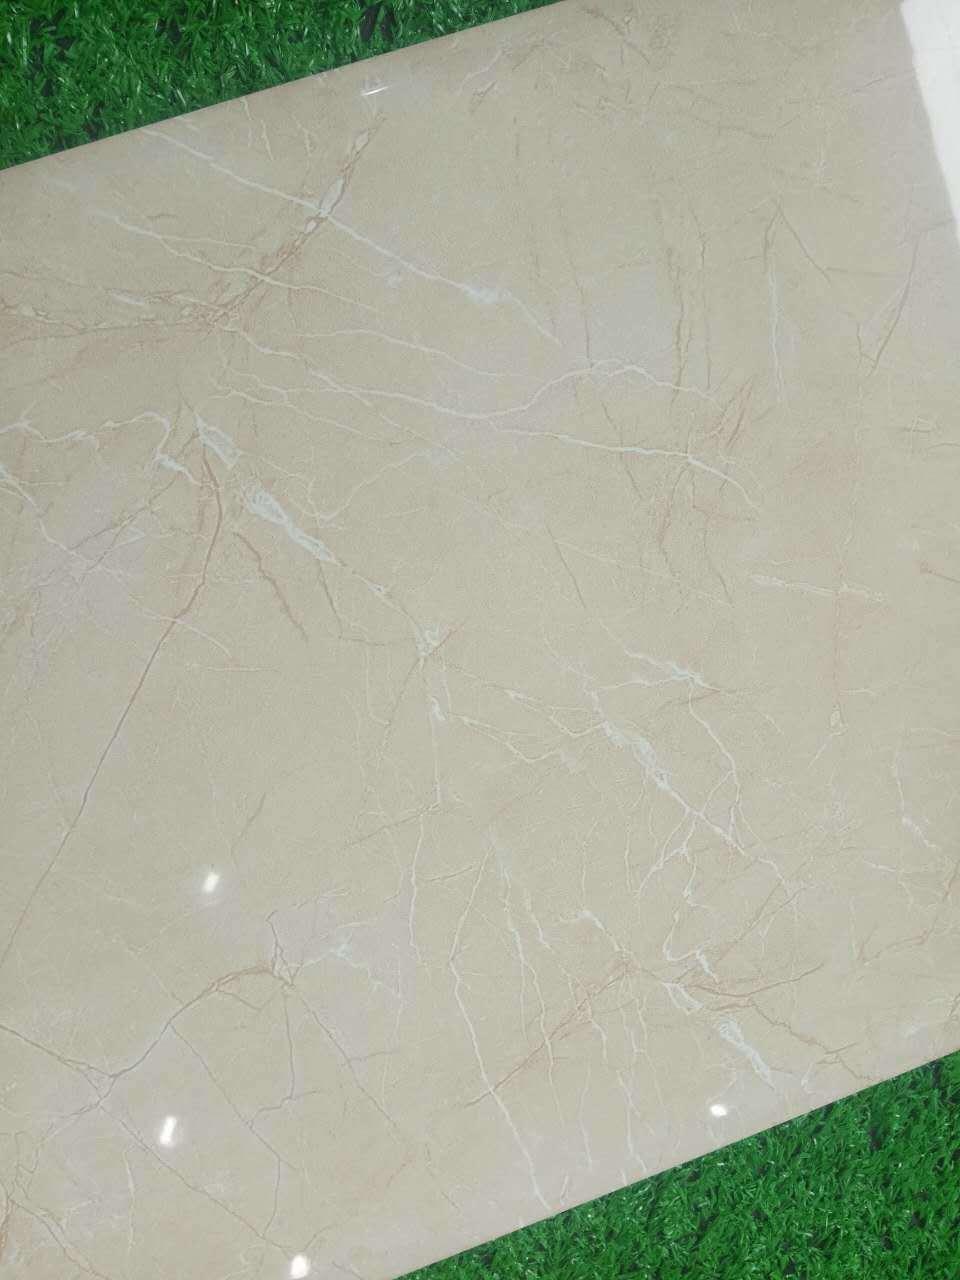 China Building Material Digital Bathroom & Kitchen Glazed Ceramic ...